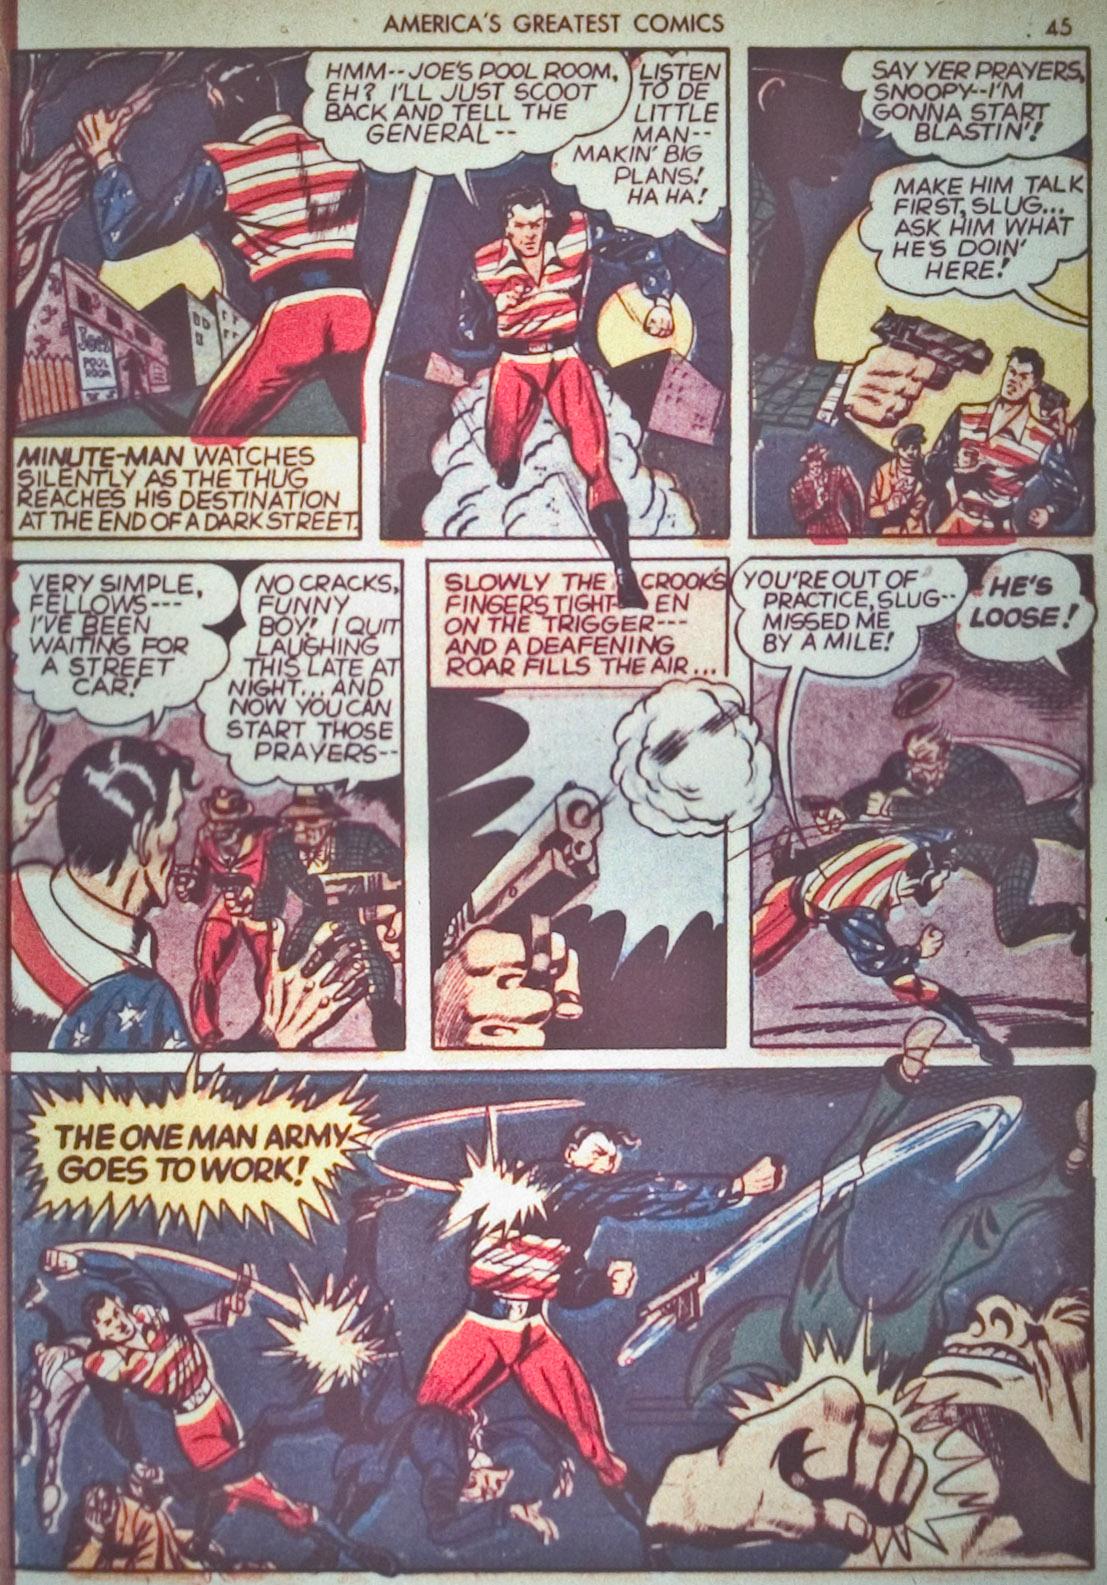 Read online America's Greatest Comics comic -  Issue #1 - 48